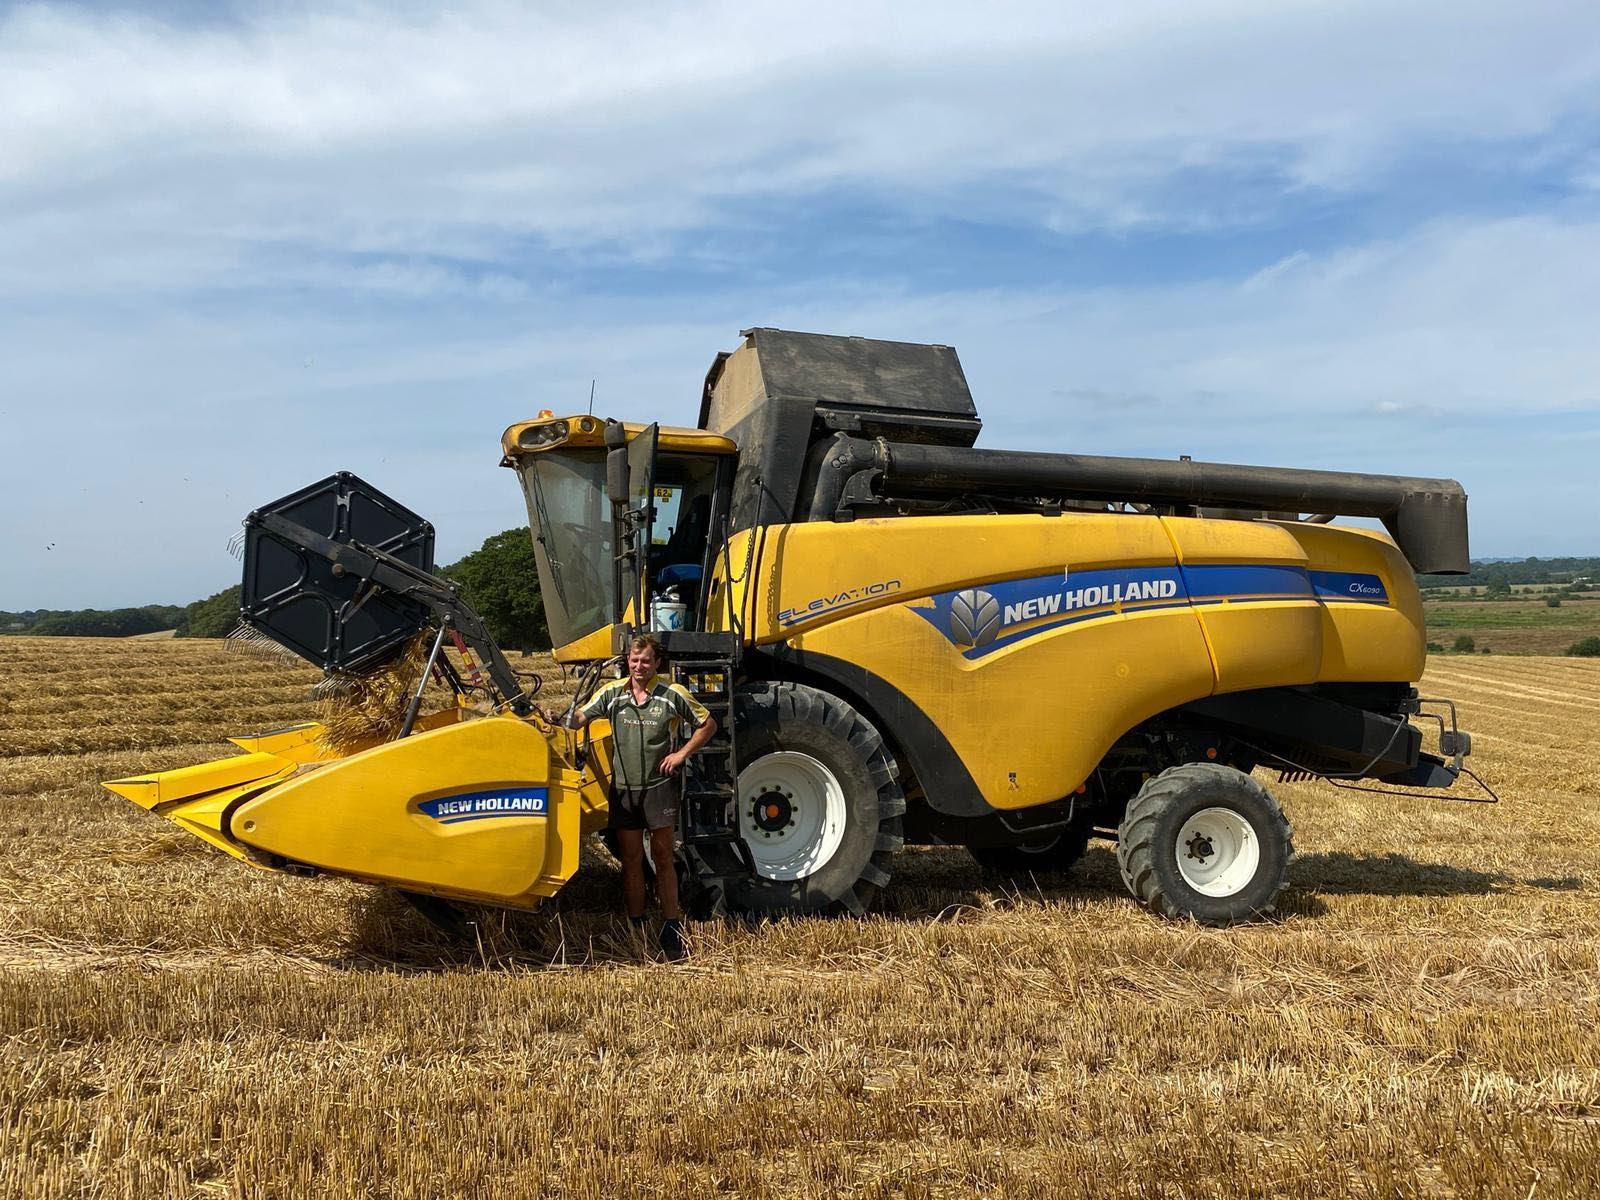 Taking stock of UK harvest season 2021: A mixed-farm perspective